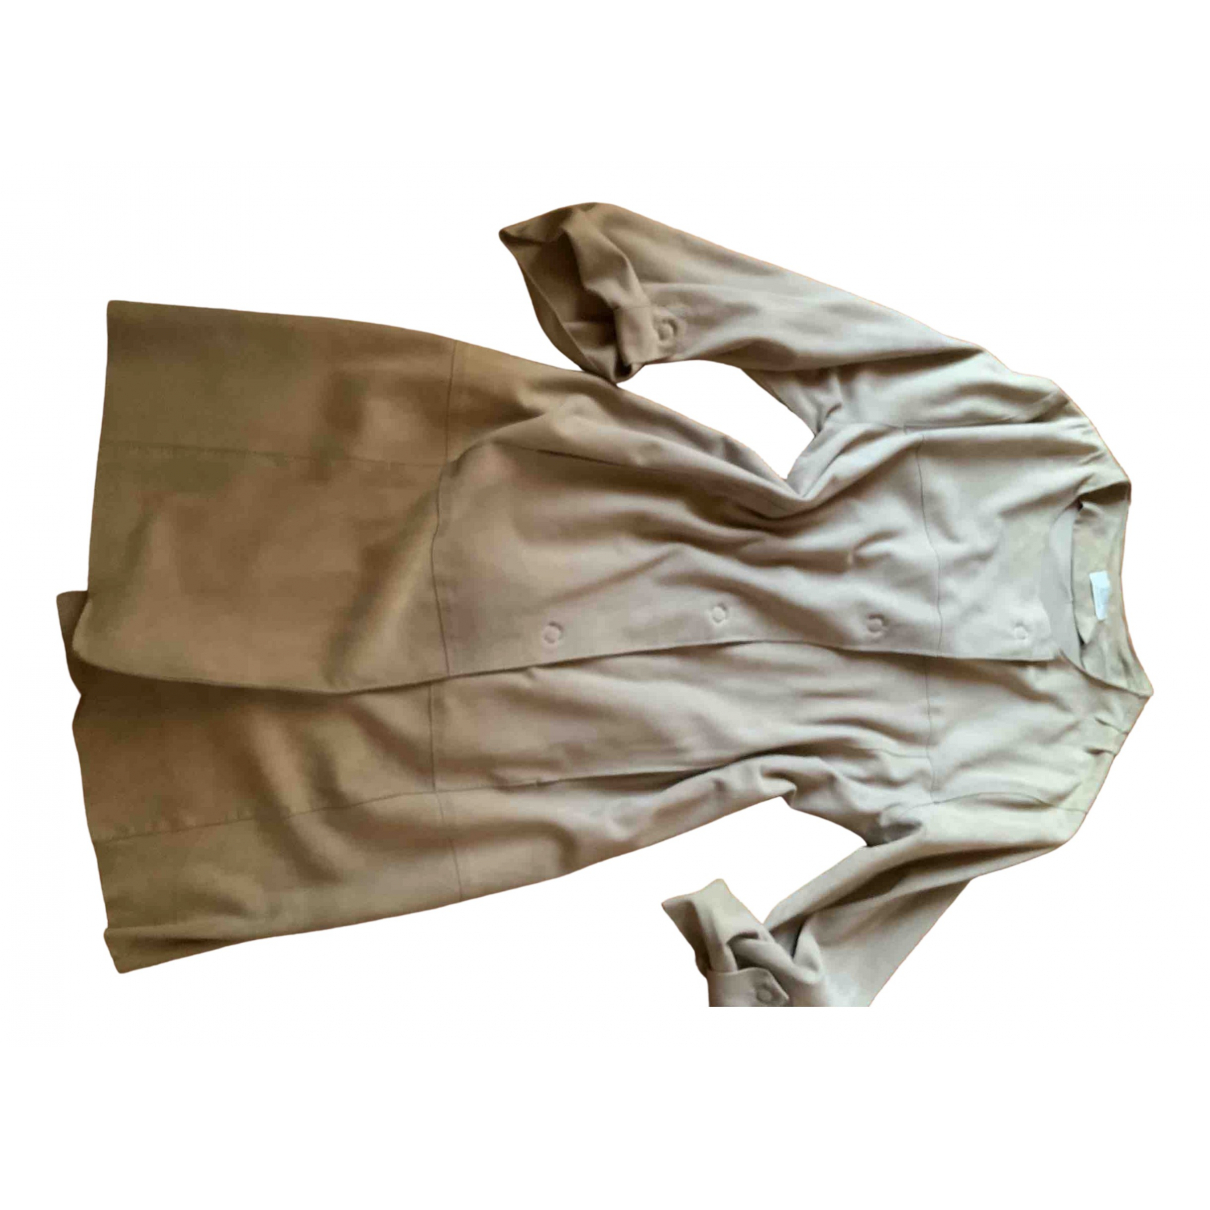 Pablo \N Beige Suede Leather jacket for Women M International